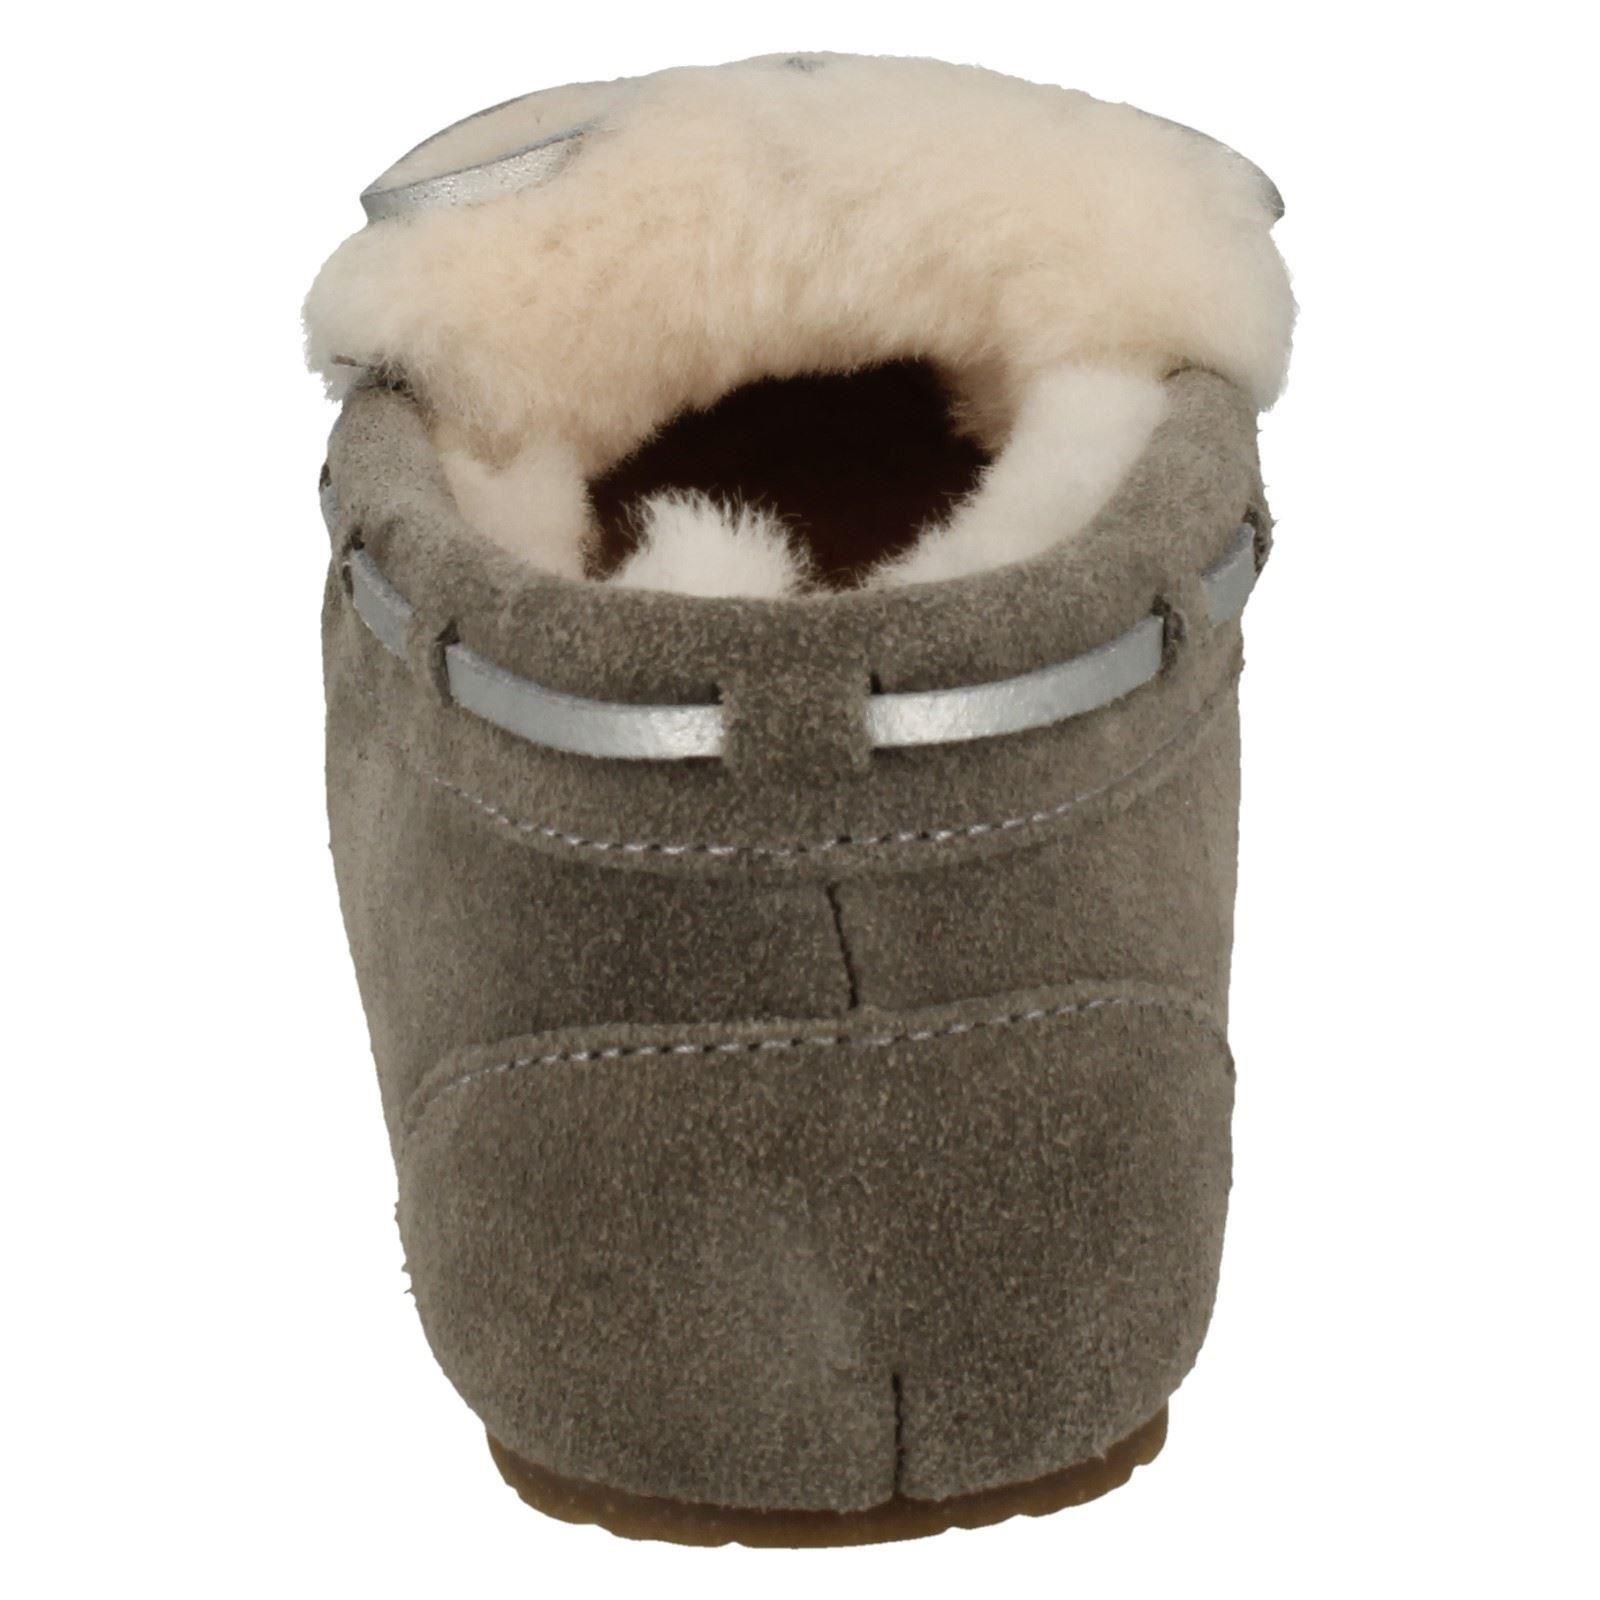 mesdames mesdames mesdames clarks de doublure chaude glamour, chaussons chauds 0d0708